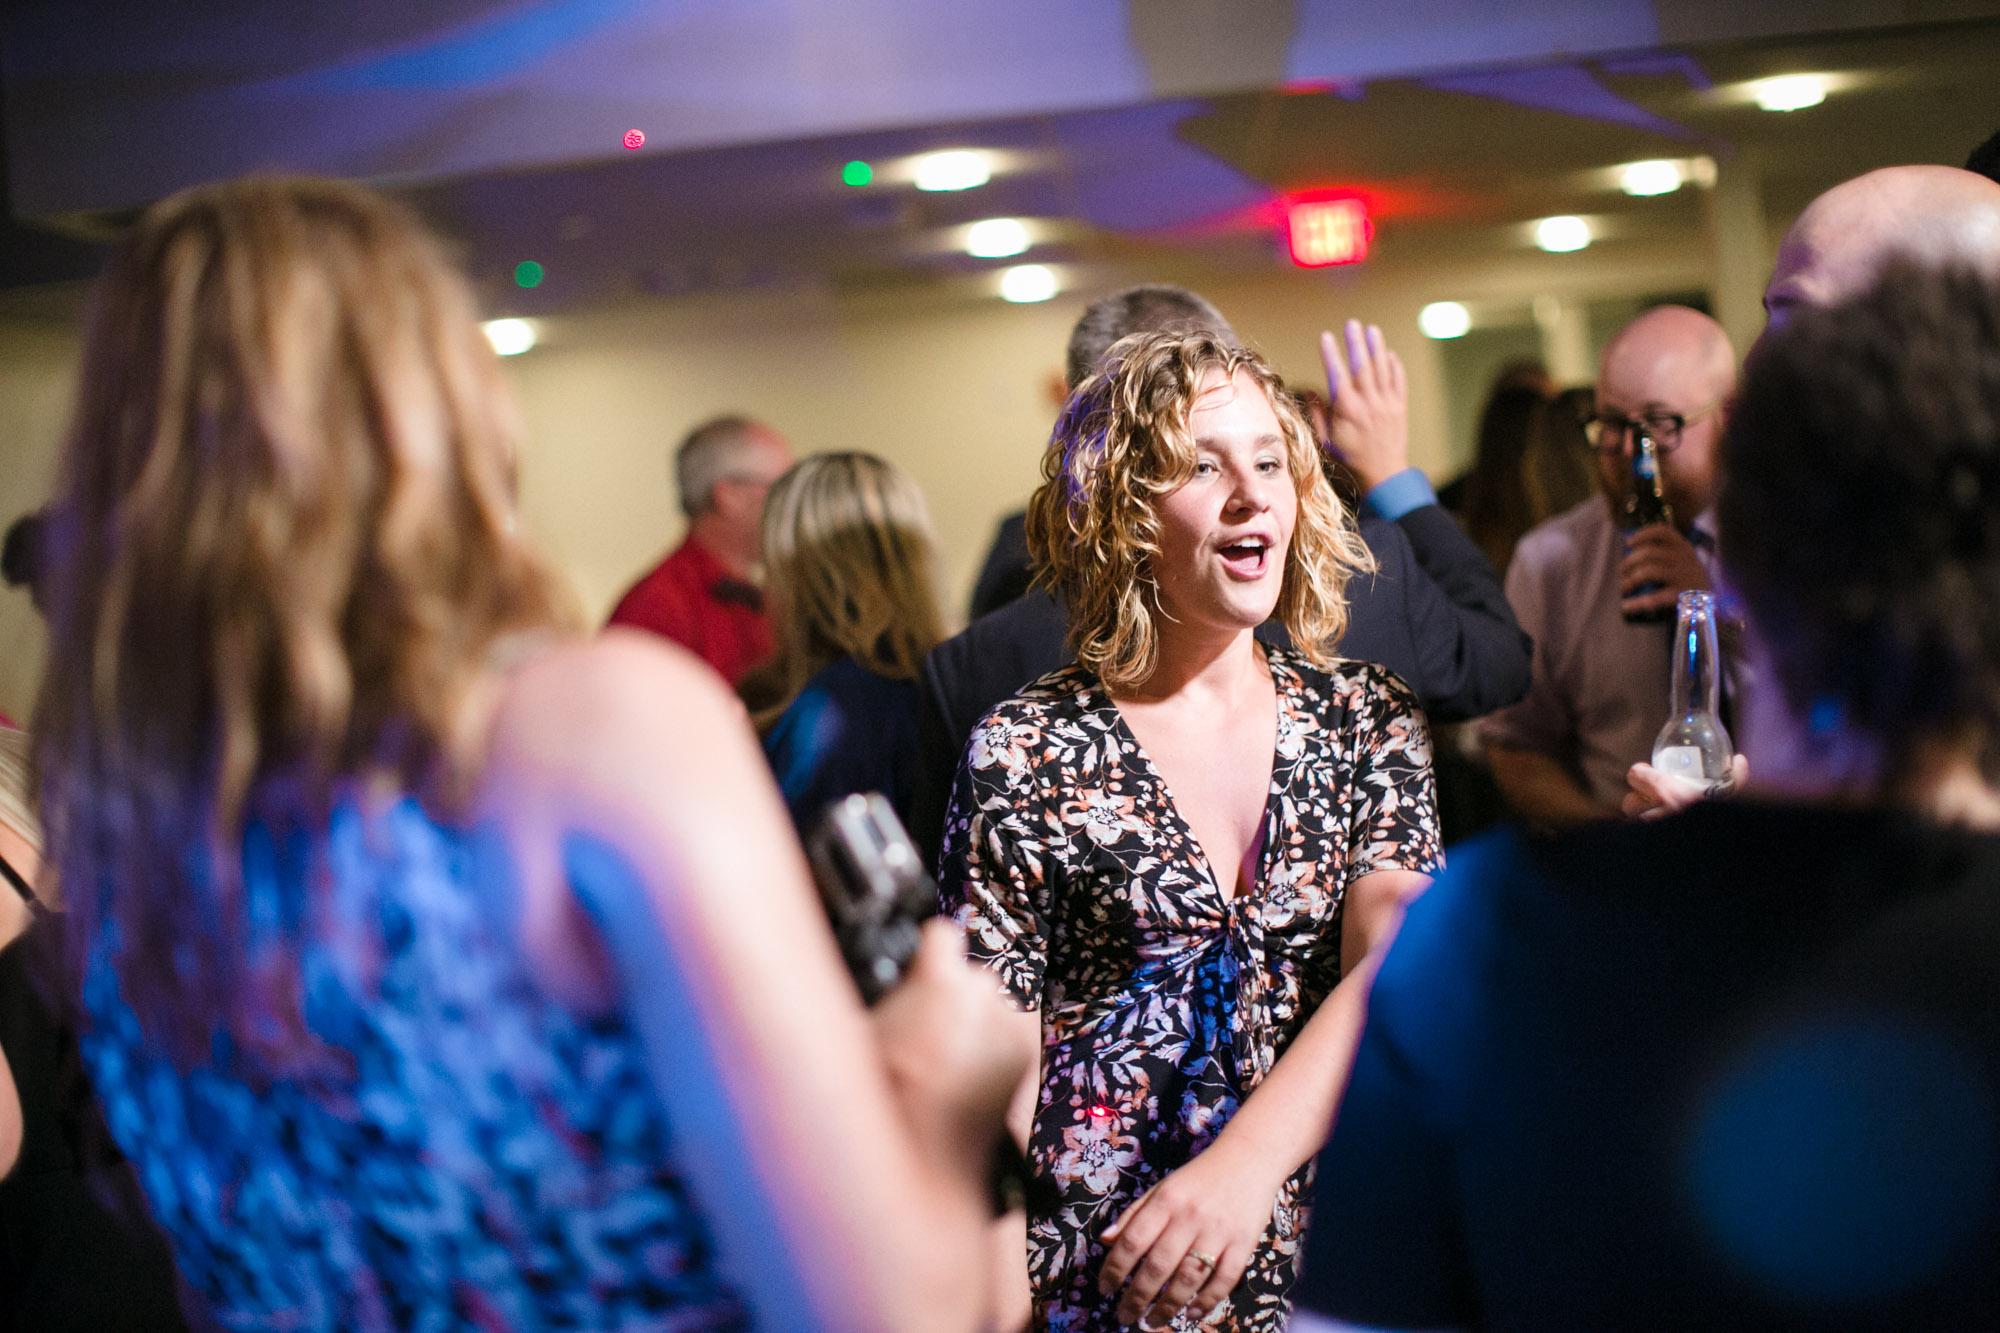 hensville-wedding-downtown-toledo-ohio (4 of 5).jpg